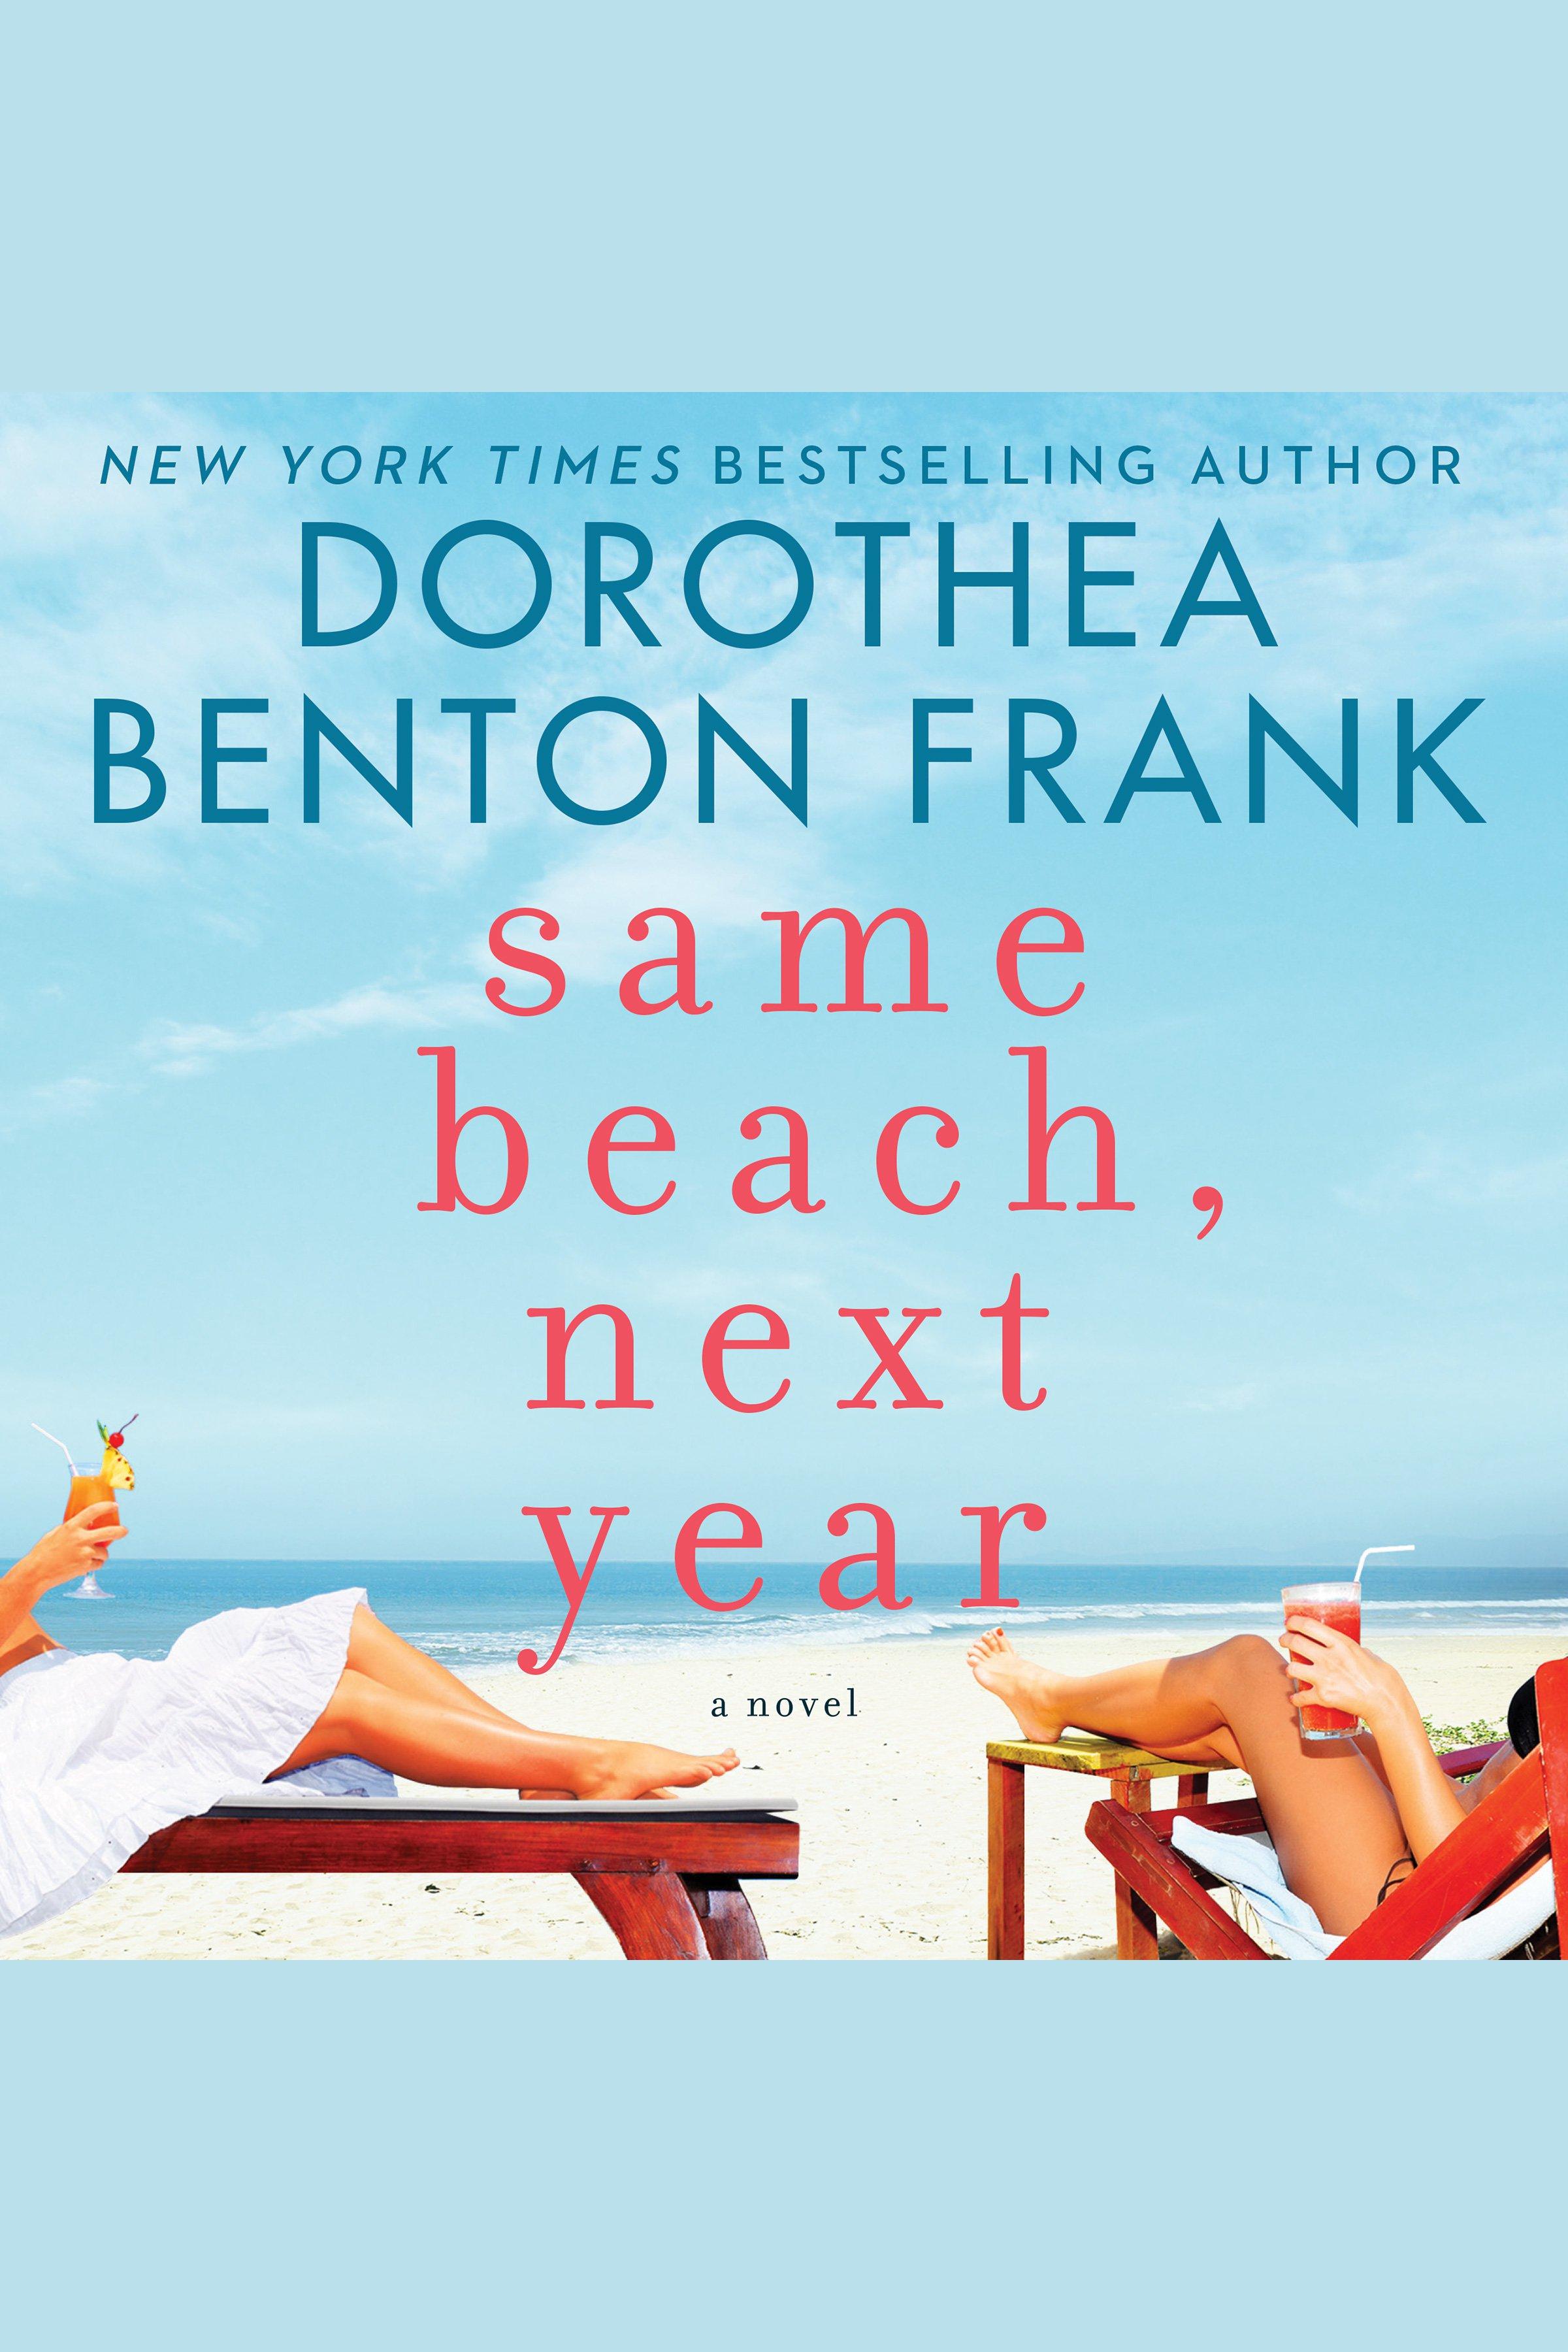 Same beach, next year [AudioEbook] : a novel